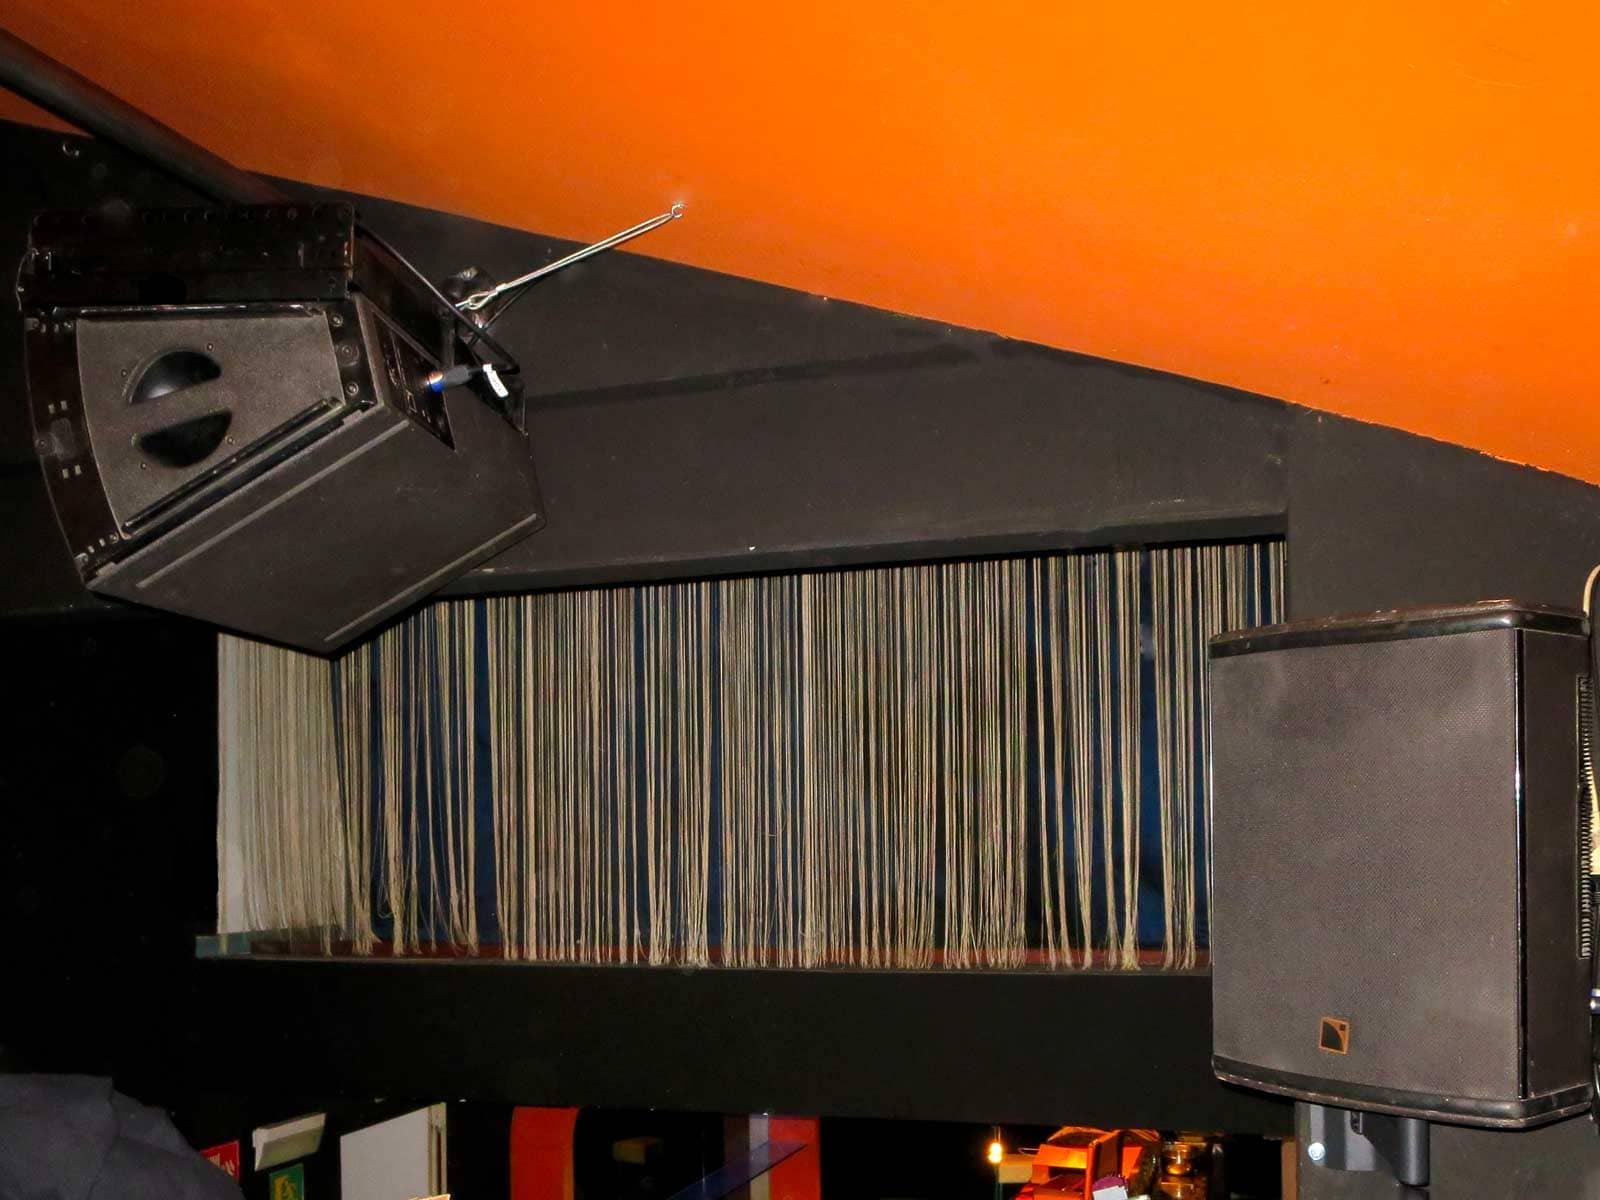 Instalaciones audiovisuales - instal·lacions audiovisuals